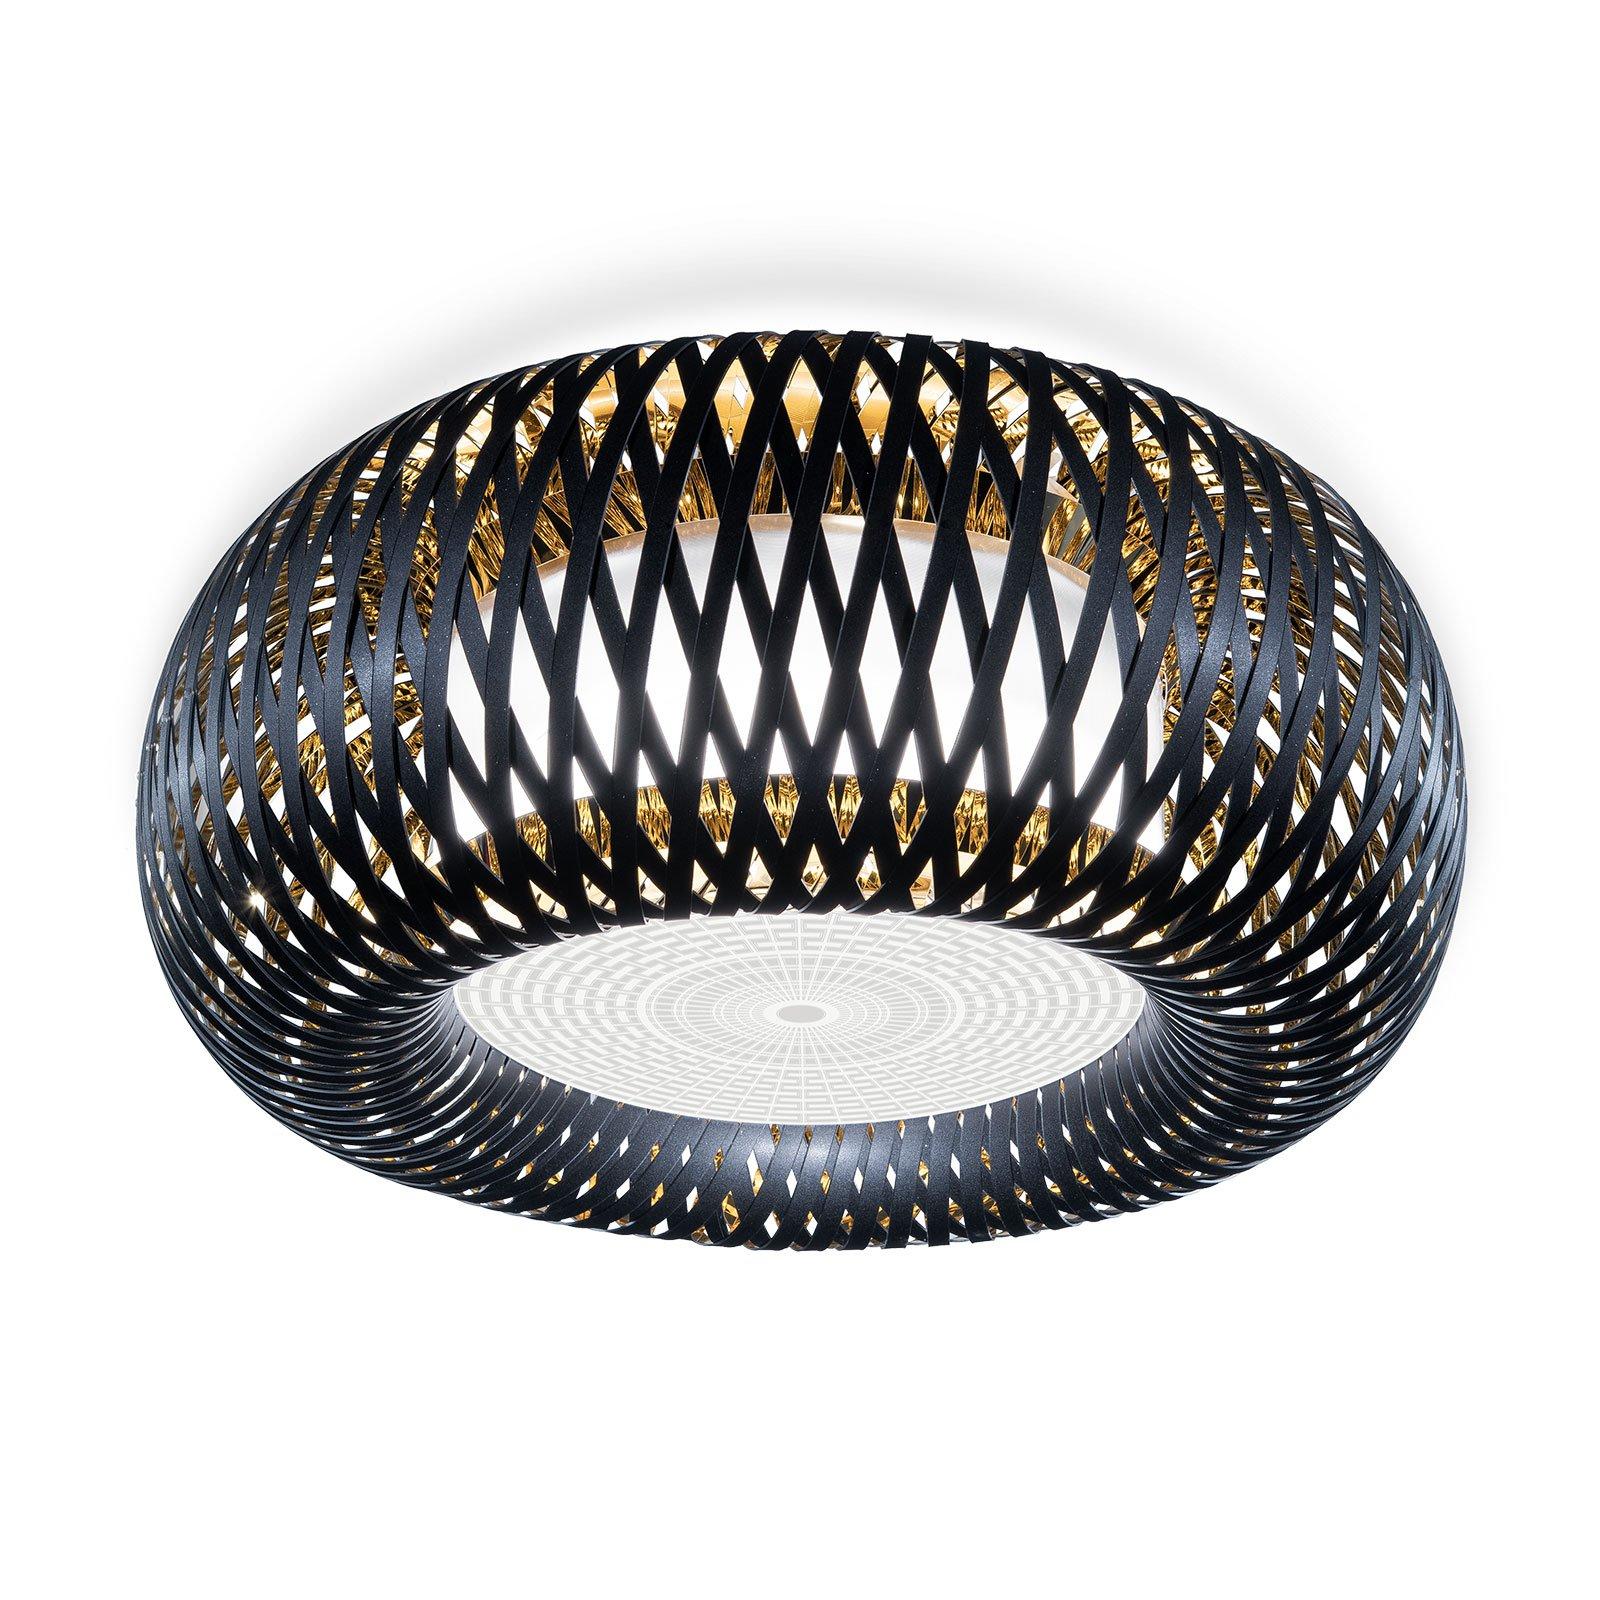 Slamp Katalos taklampe, svart/gull/hvit